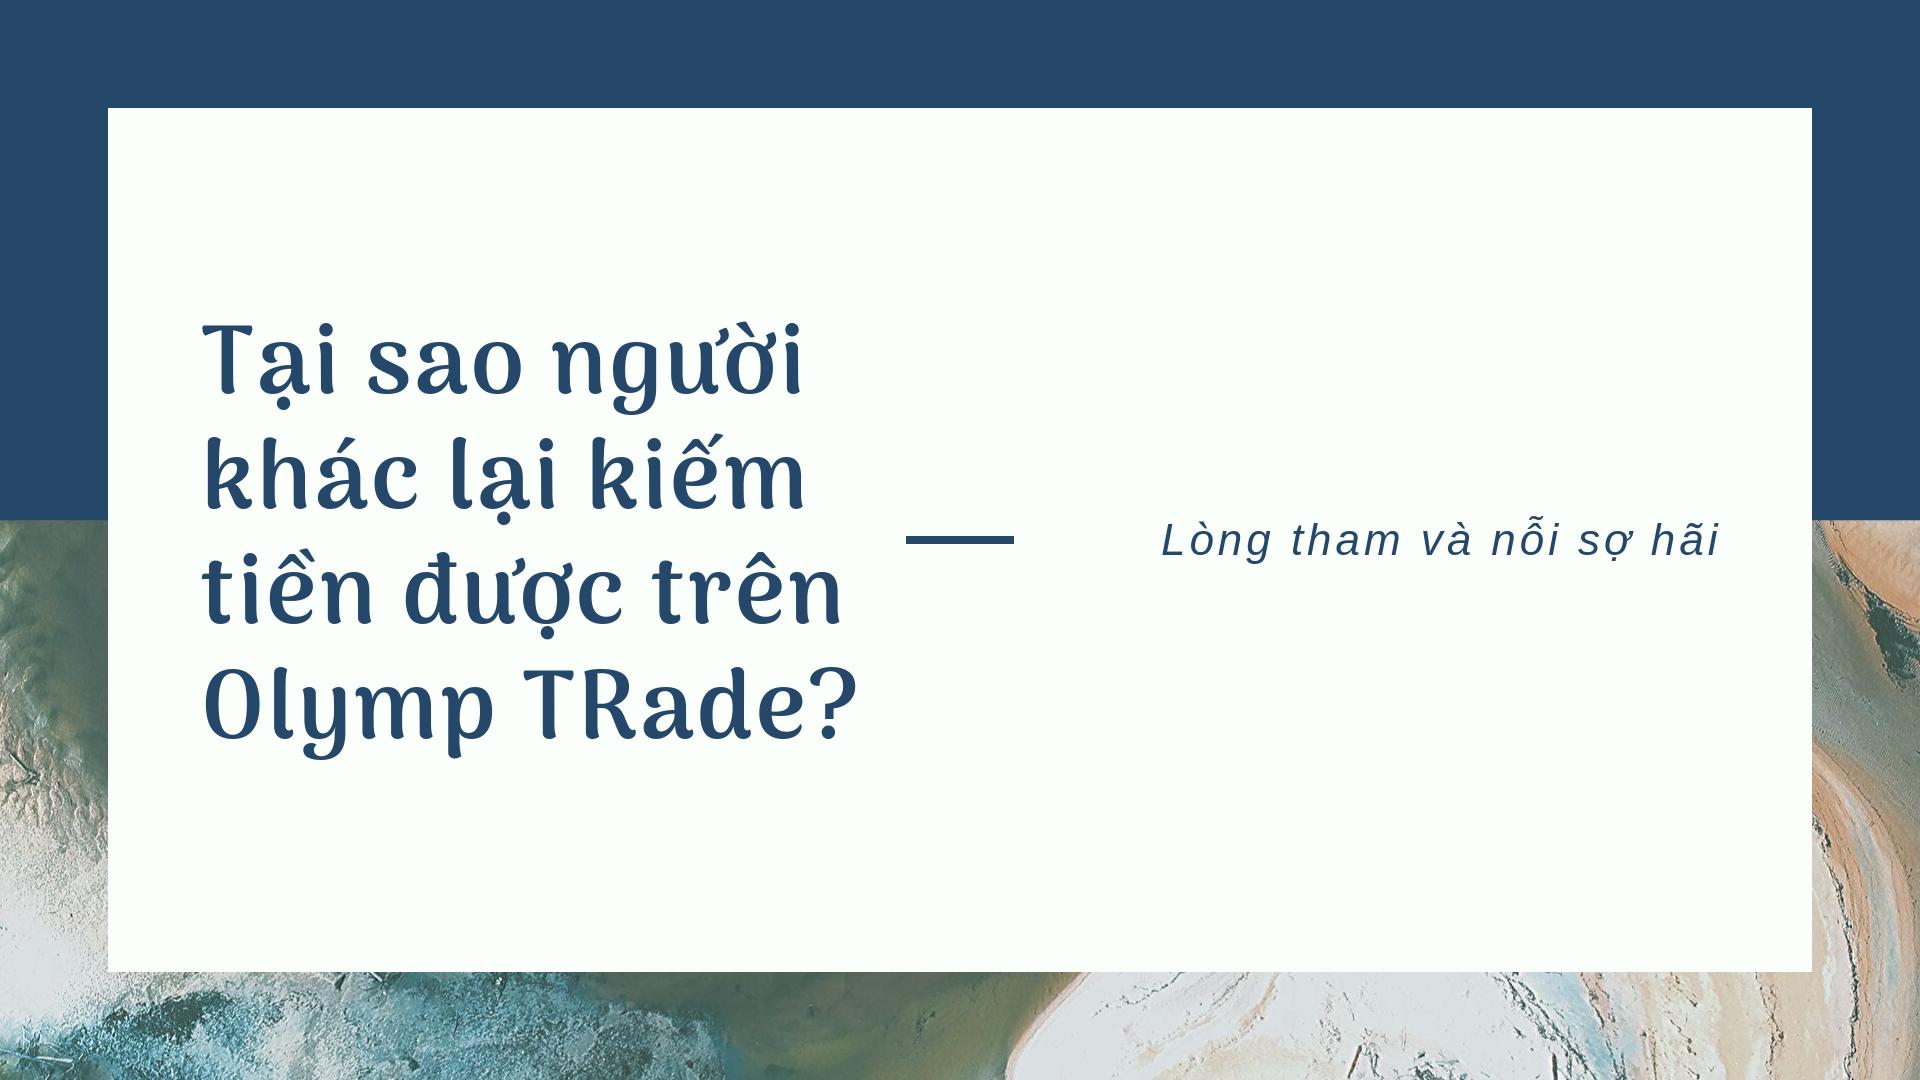 Tai-sao-mot-so-nguoi-kiem-tien-olymp-trade-de-dang